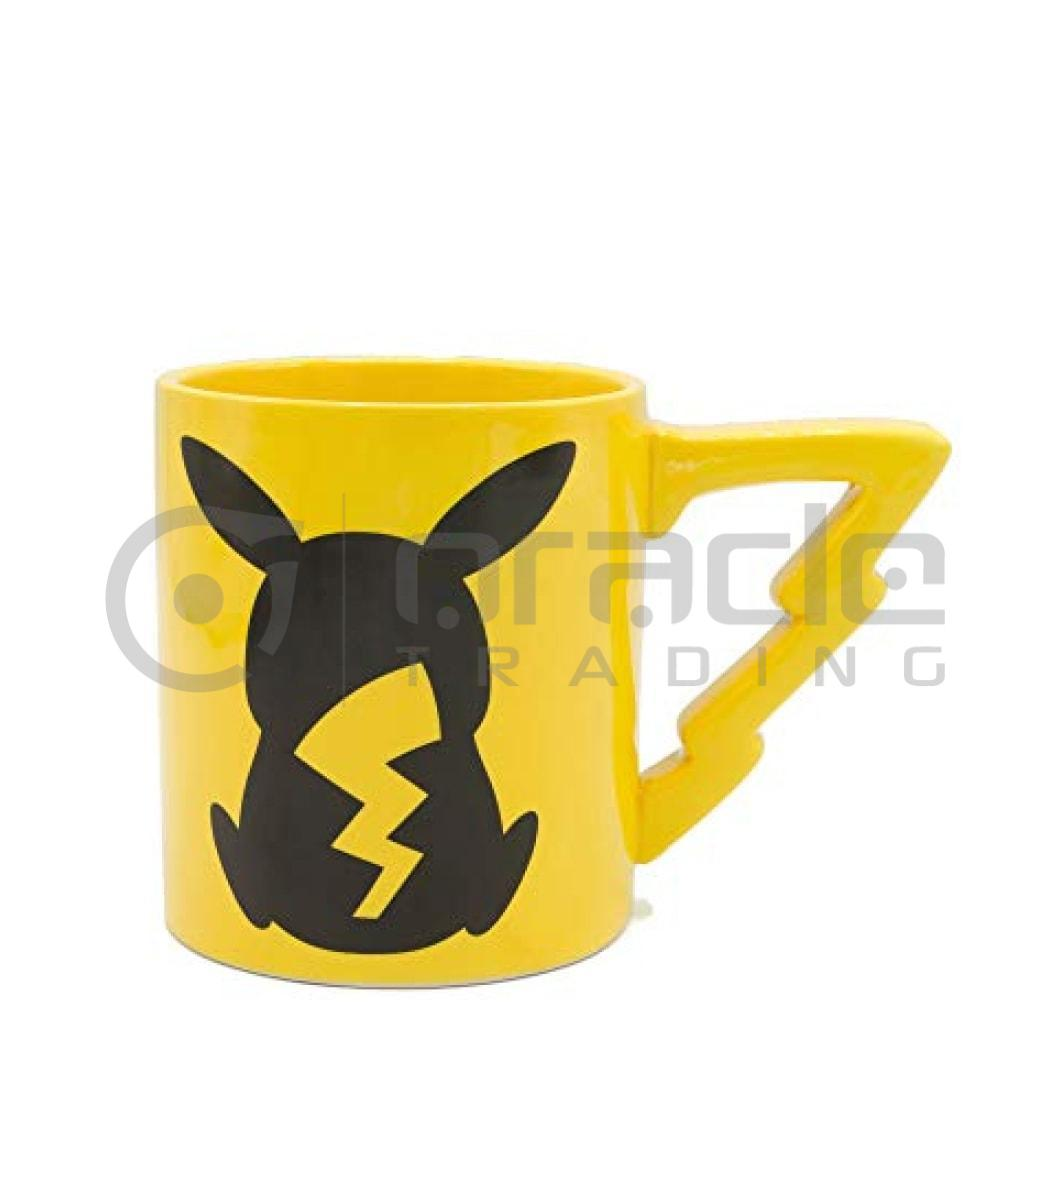 Pokémon Sculpted Mug - Pikachu